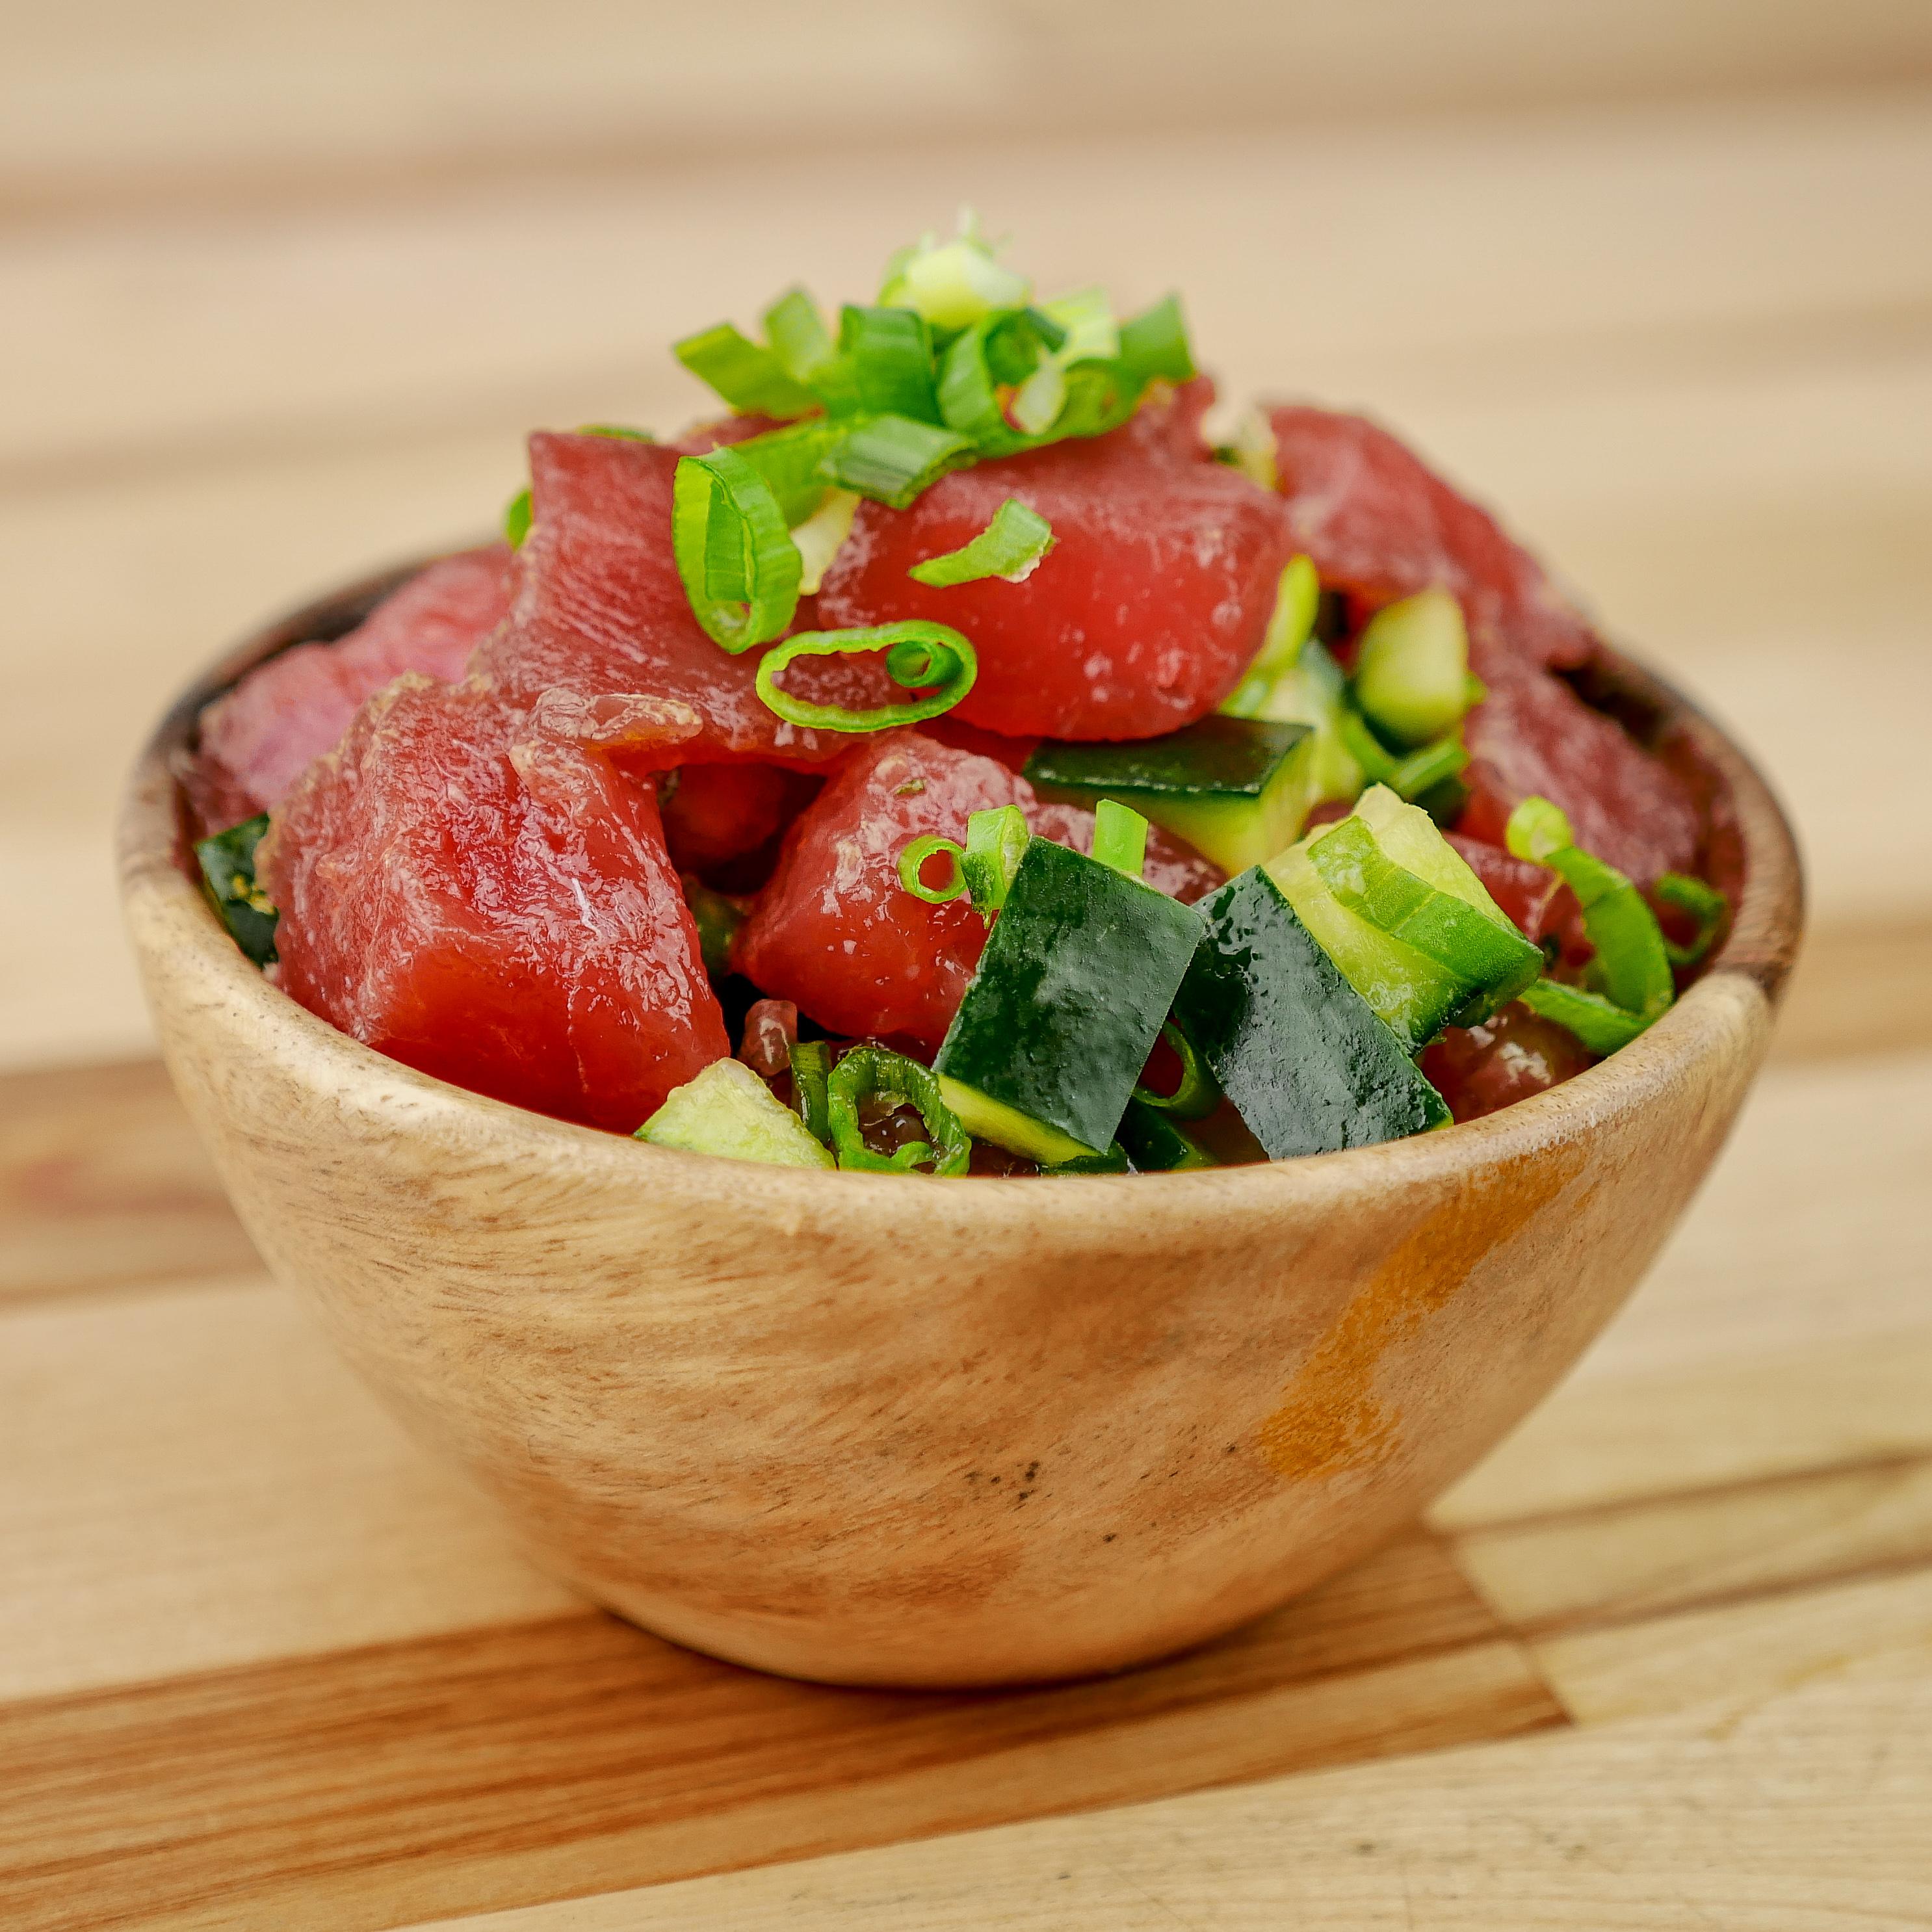 A small wooden bowl of shoyu tuna poke from Love Art Poke